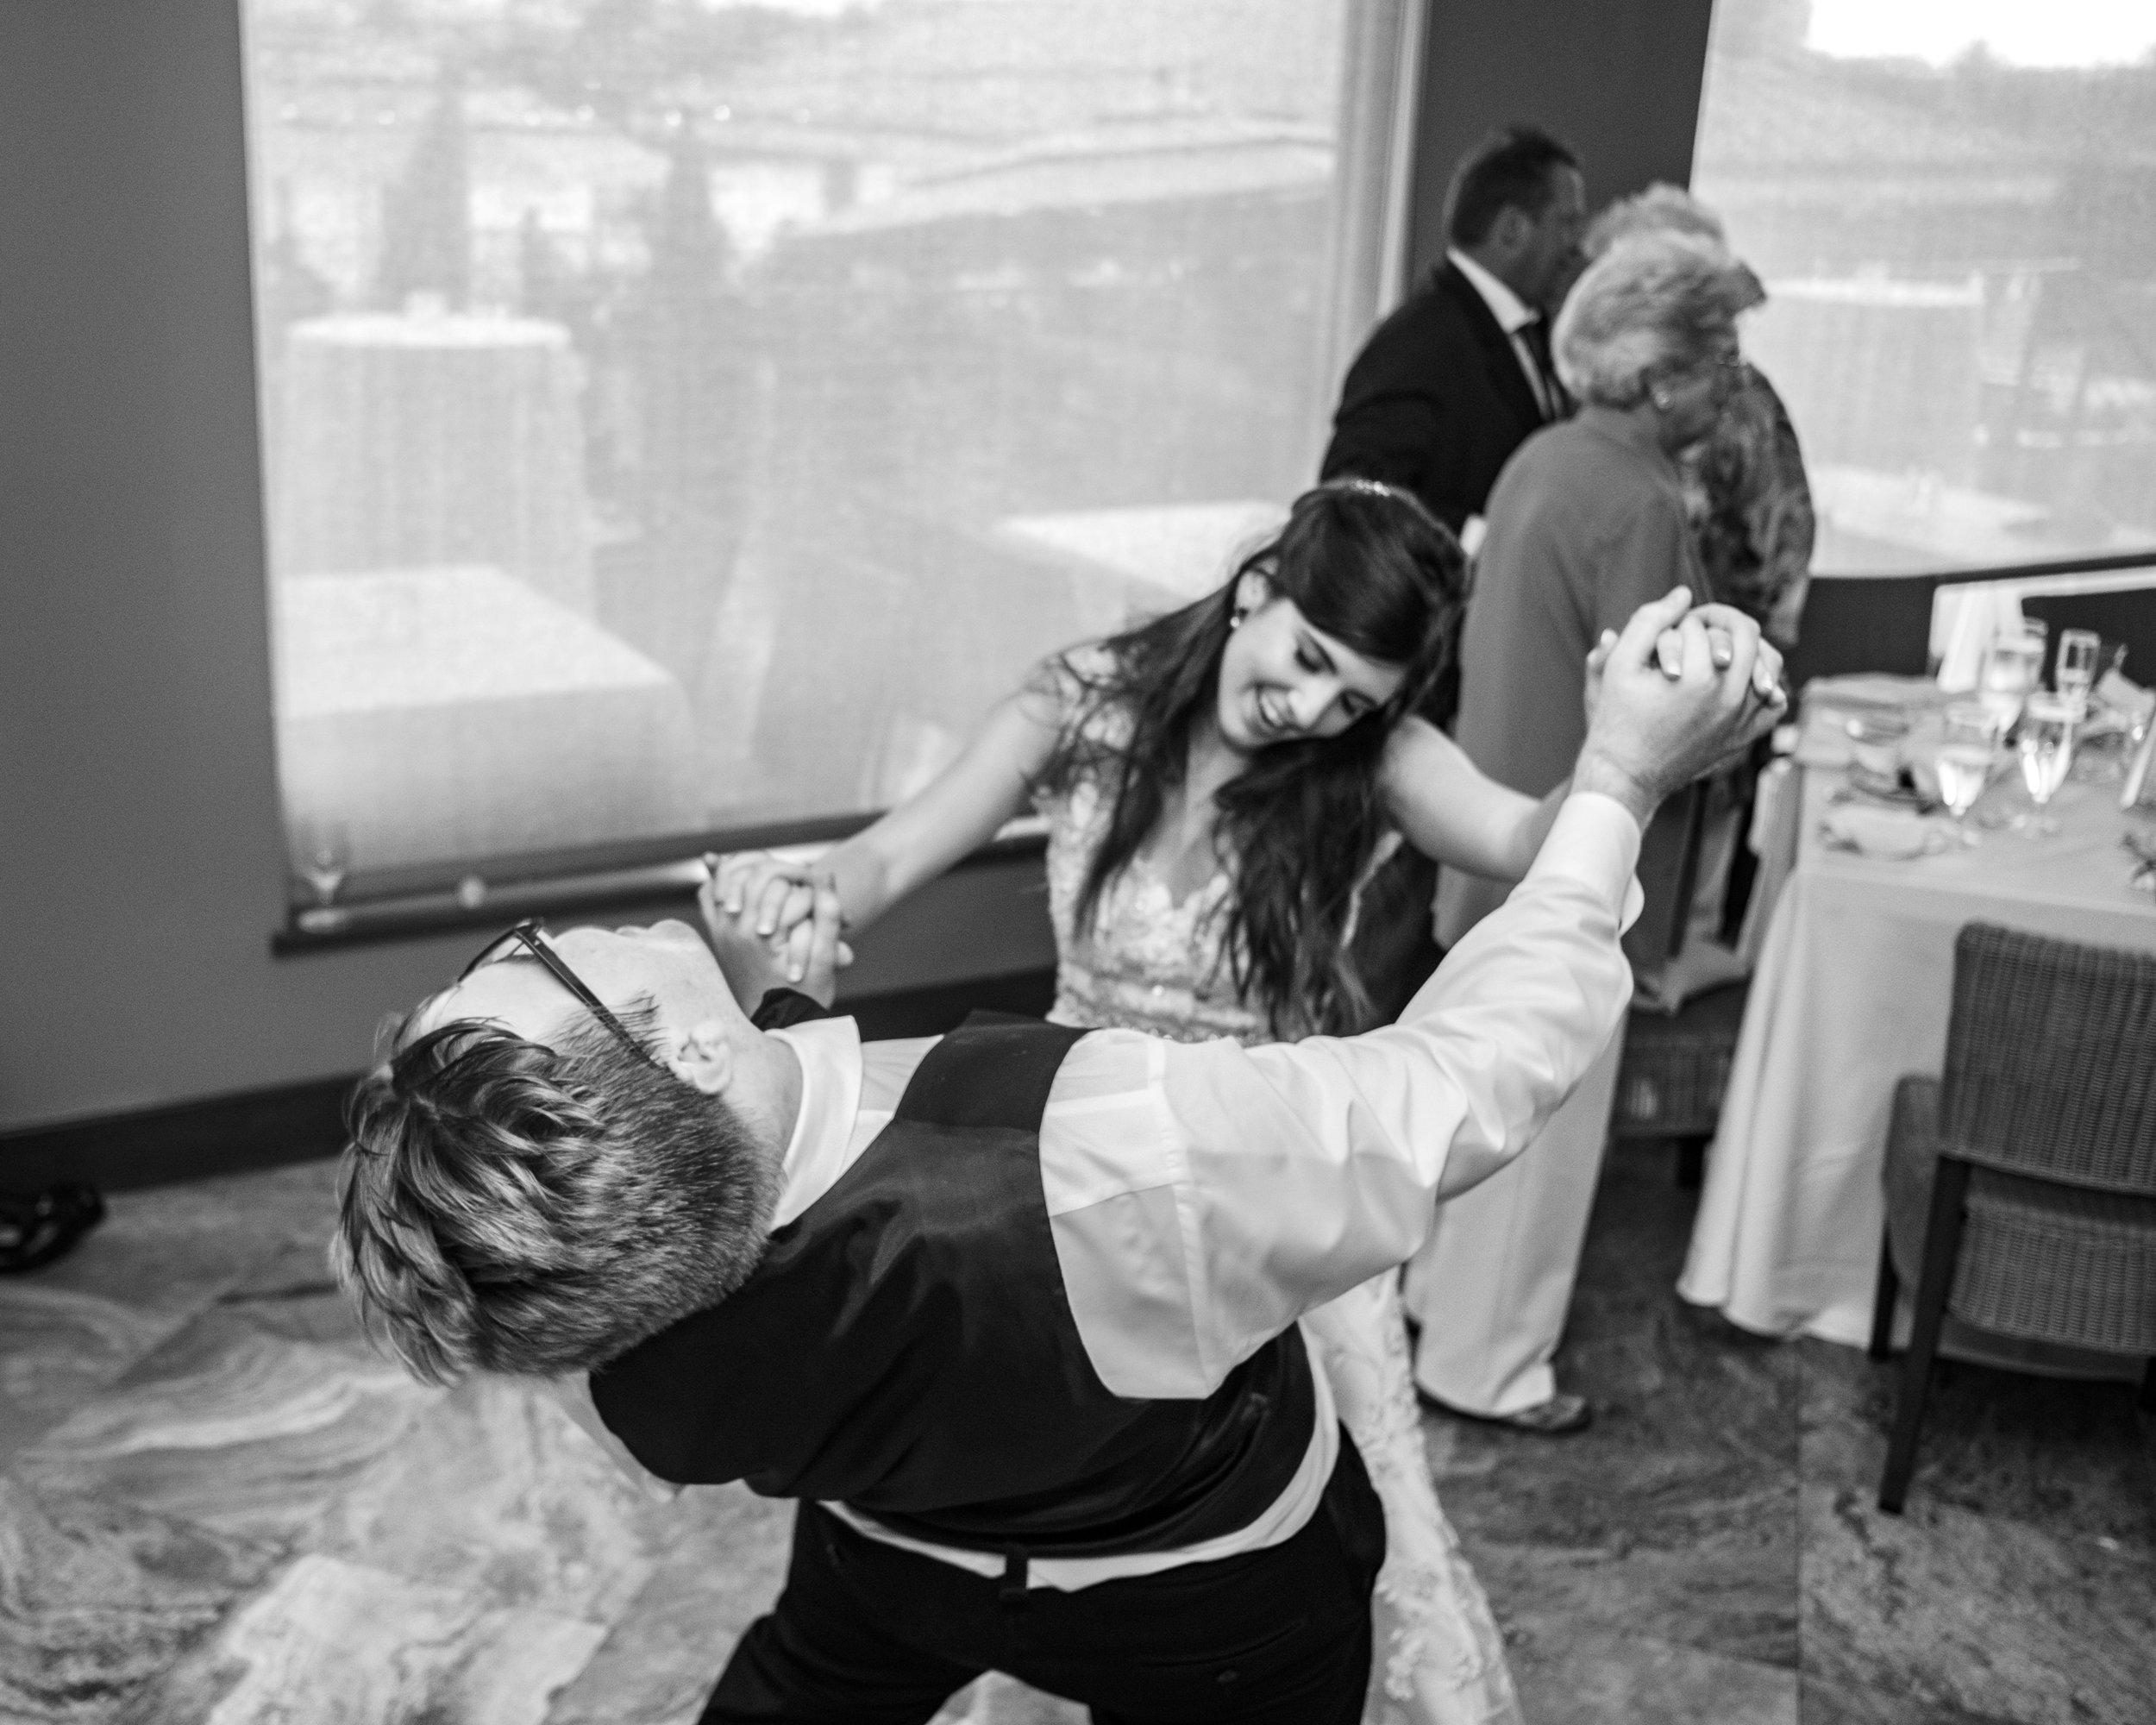 HAH_Zoe and Daniel_Clearwater Wedding_770_2018.jpg